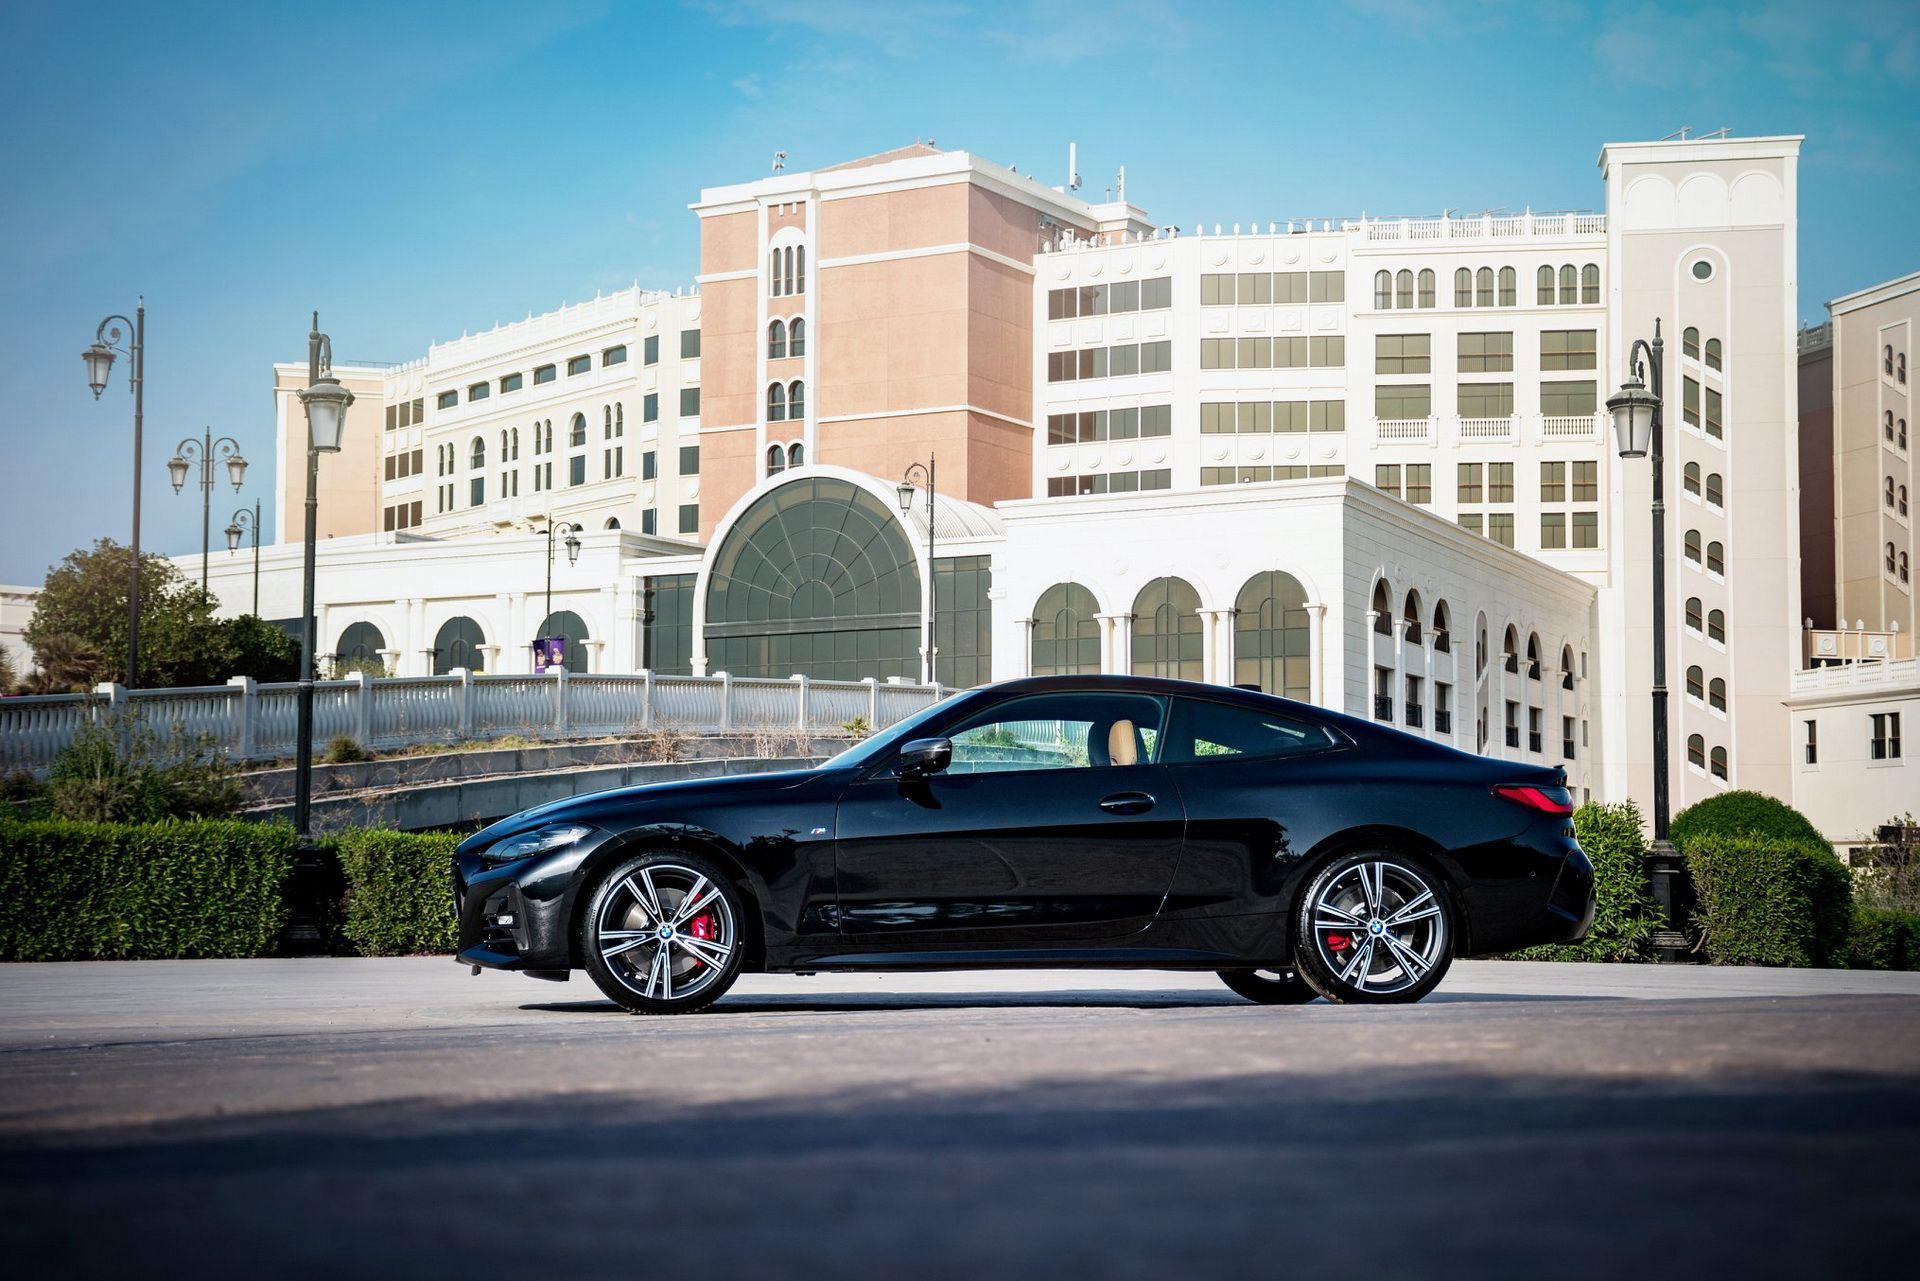 2021_BMW_4-Series_Coupe_Dark_Edition_UAE_0006